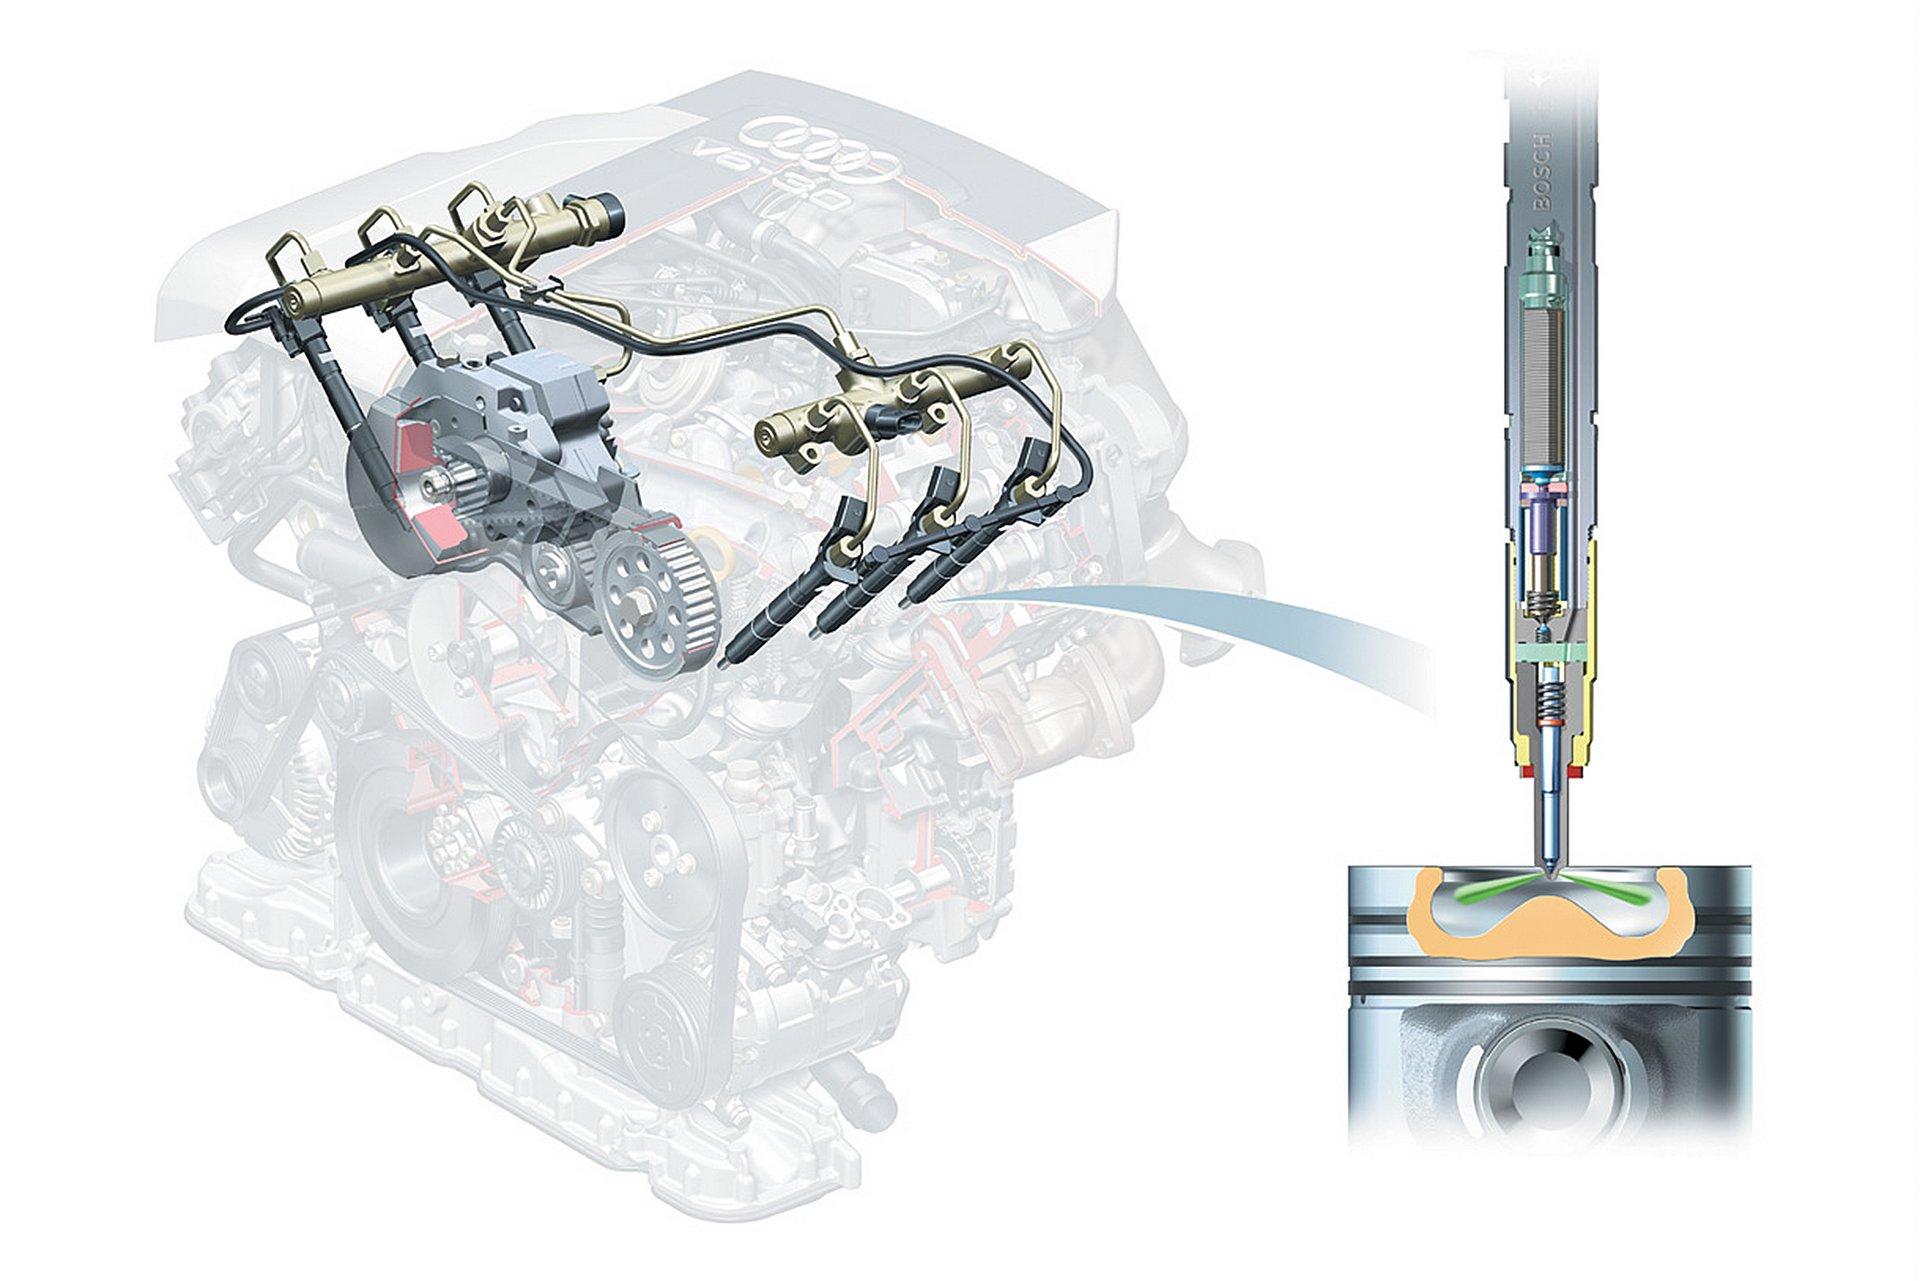 Система впрыска топлива с механическим ТНВД